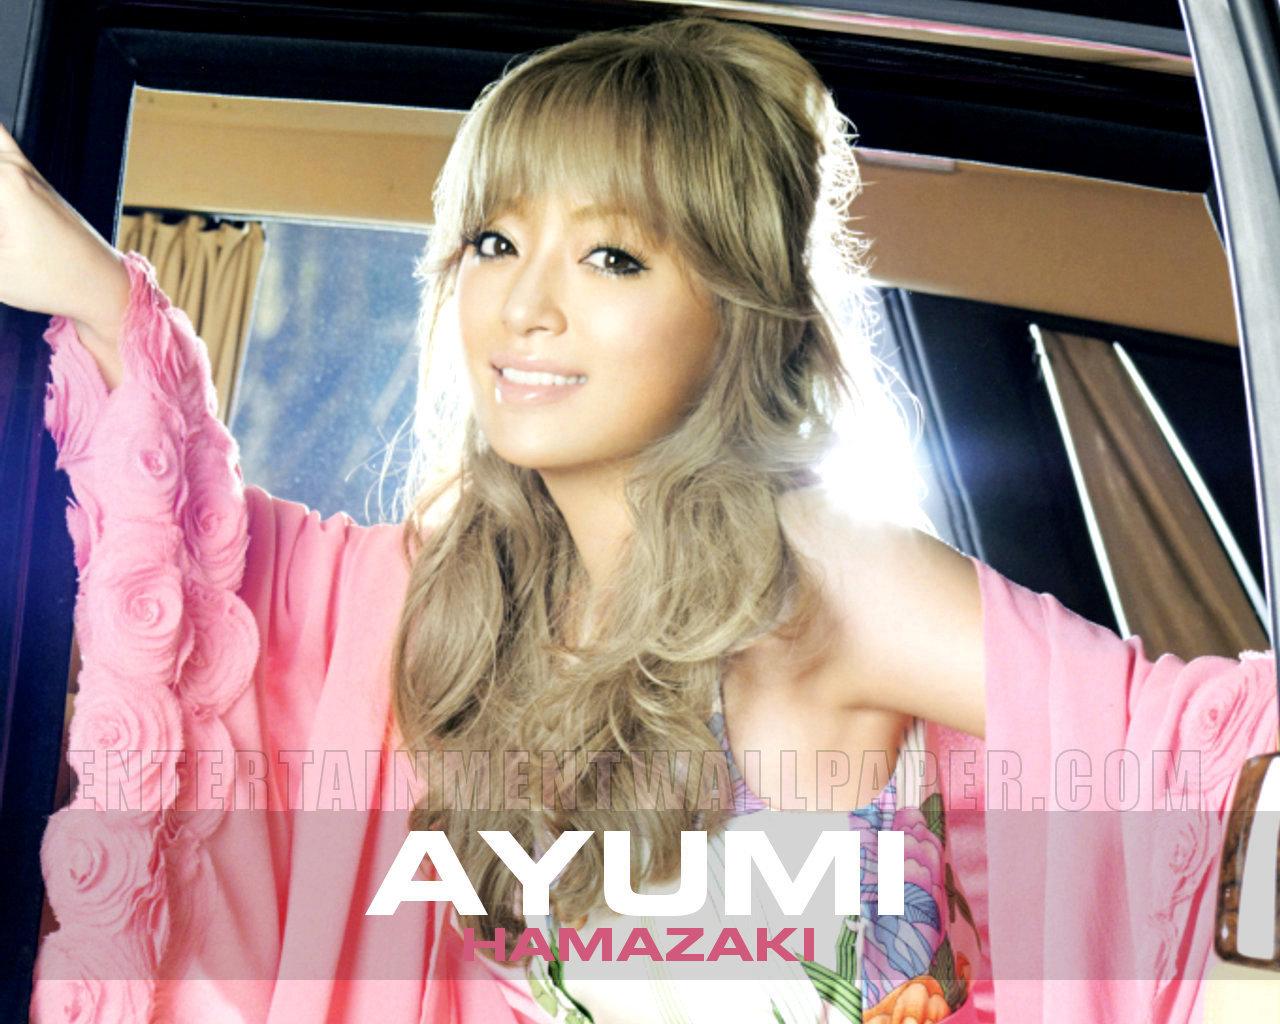 ayumi hamasaki wallpaper - photo #46